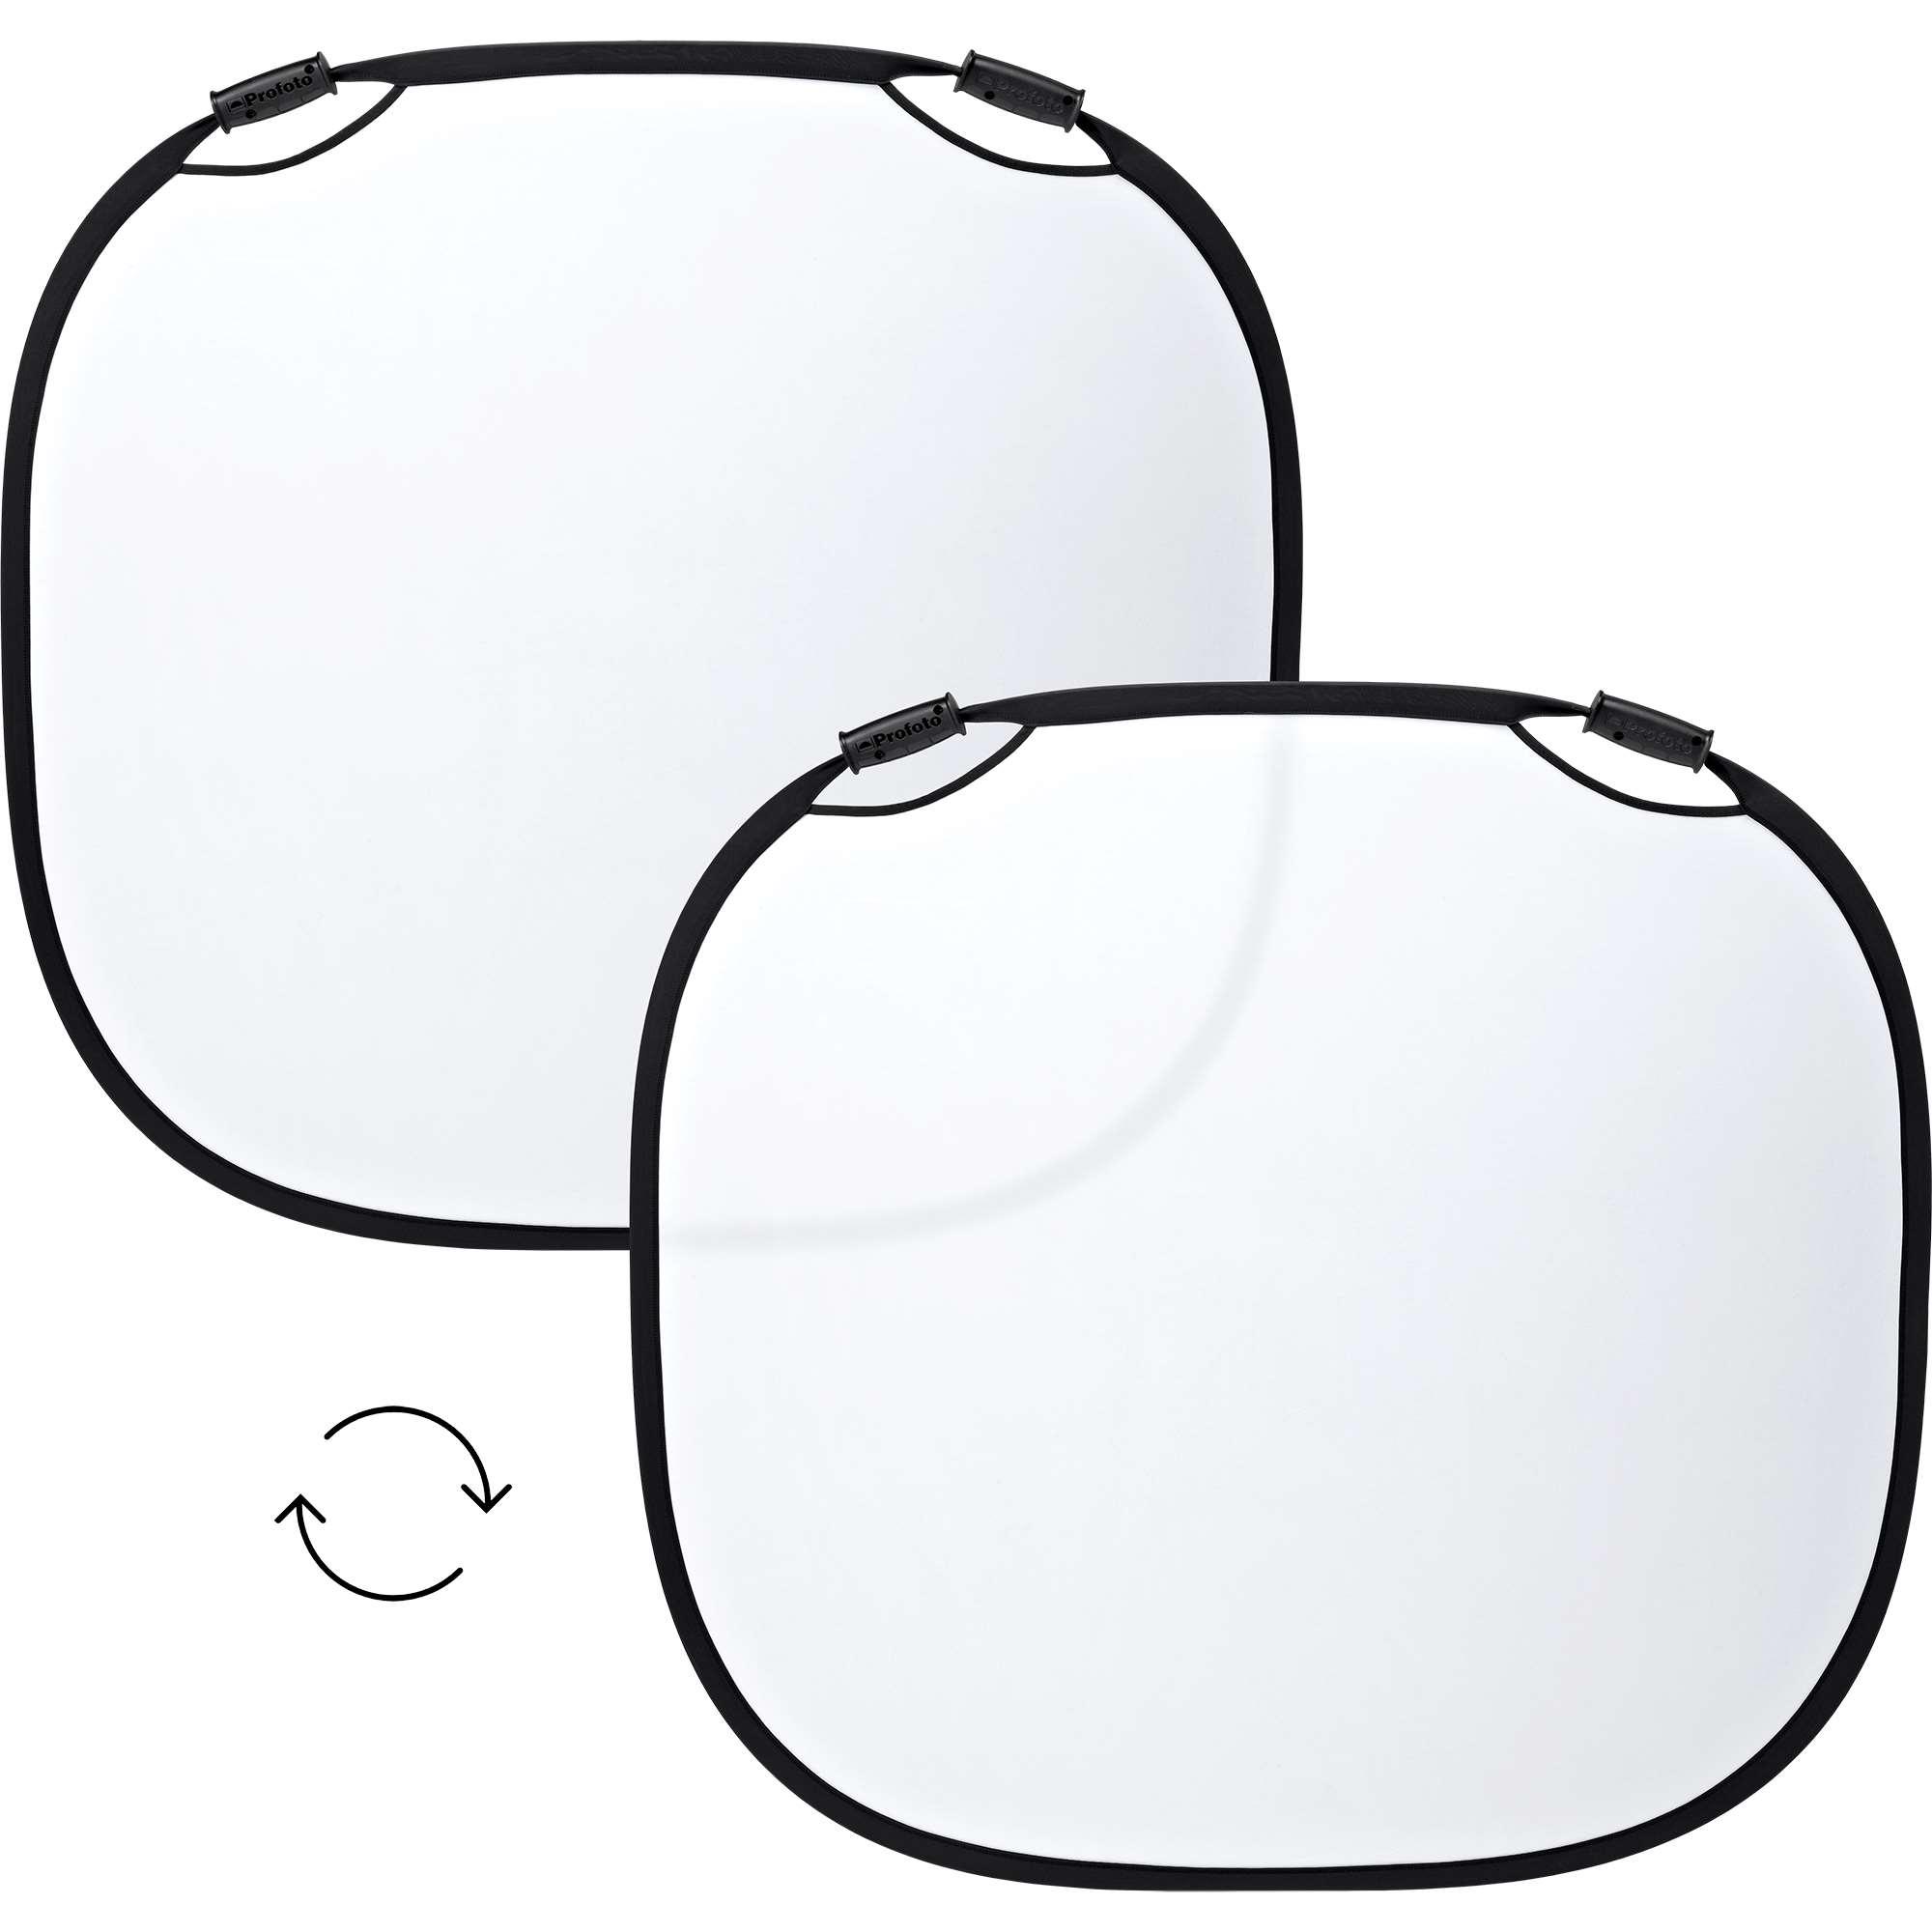 Profoto collapsible reflector l translucent (100969)